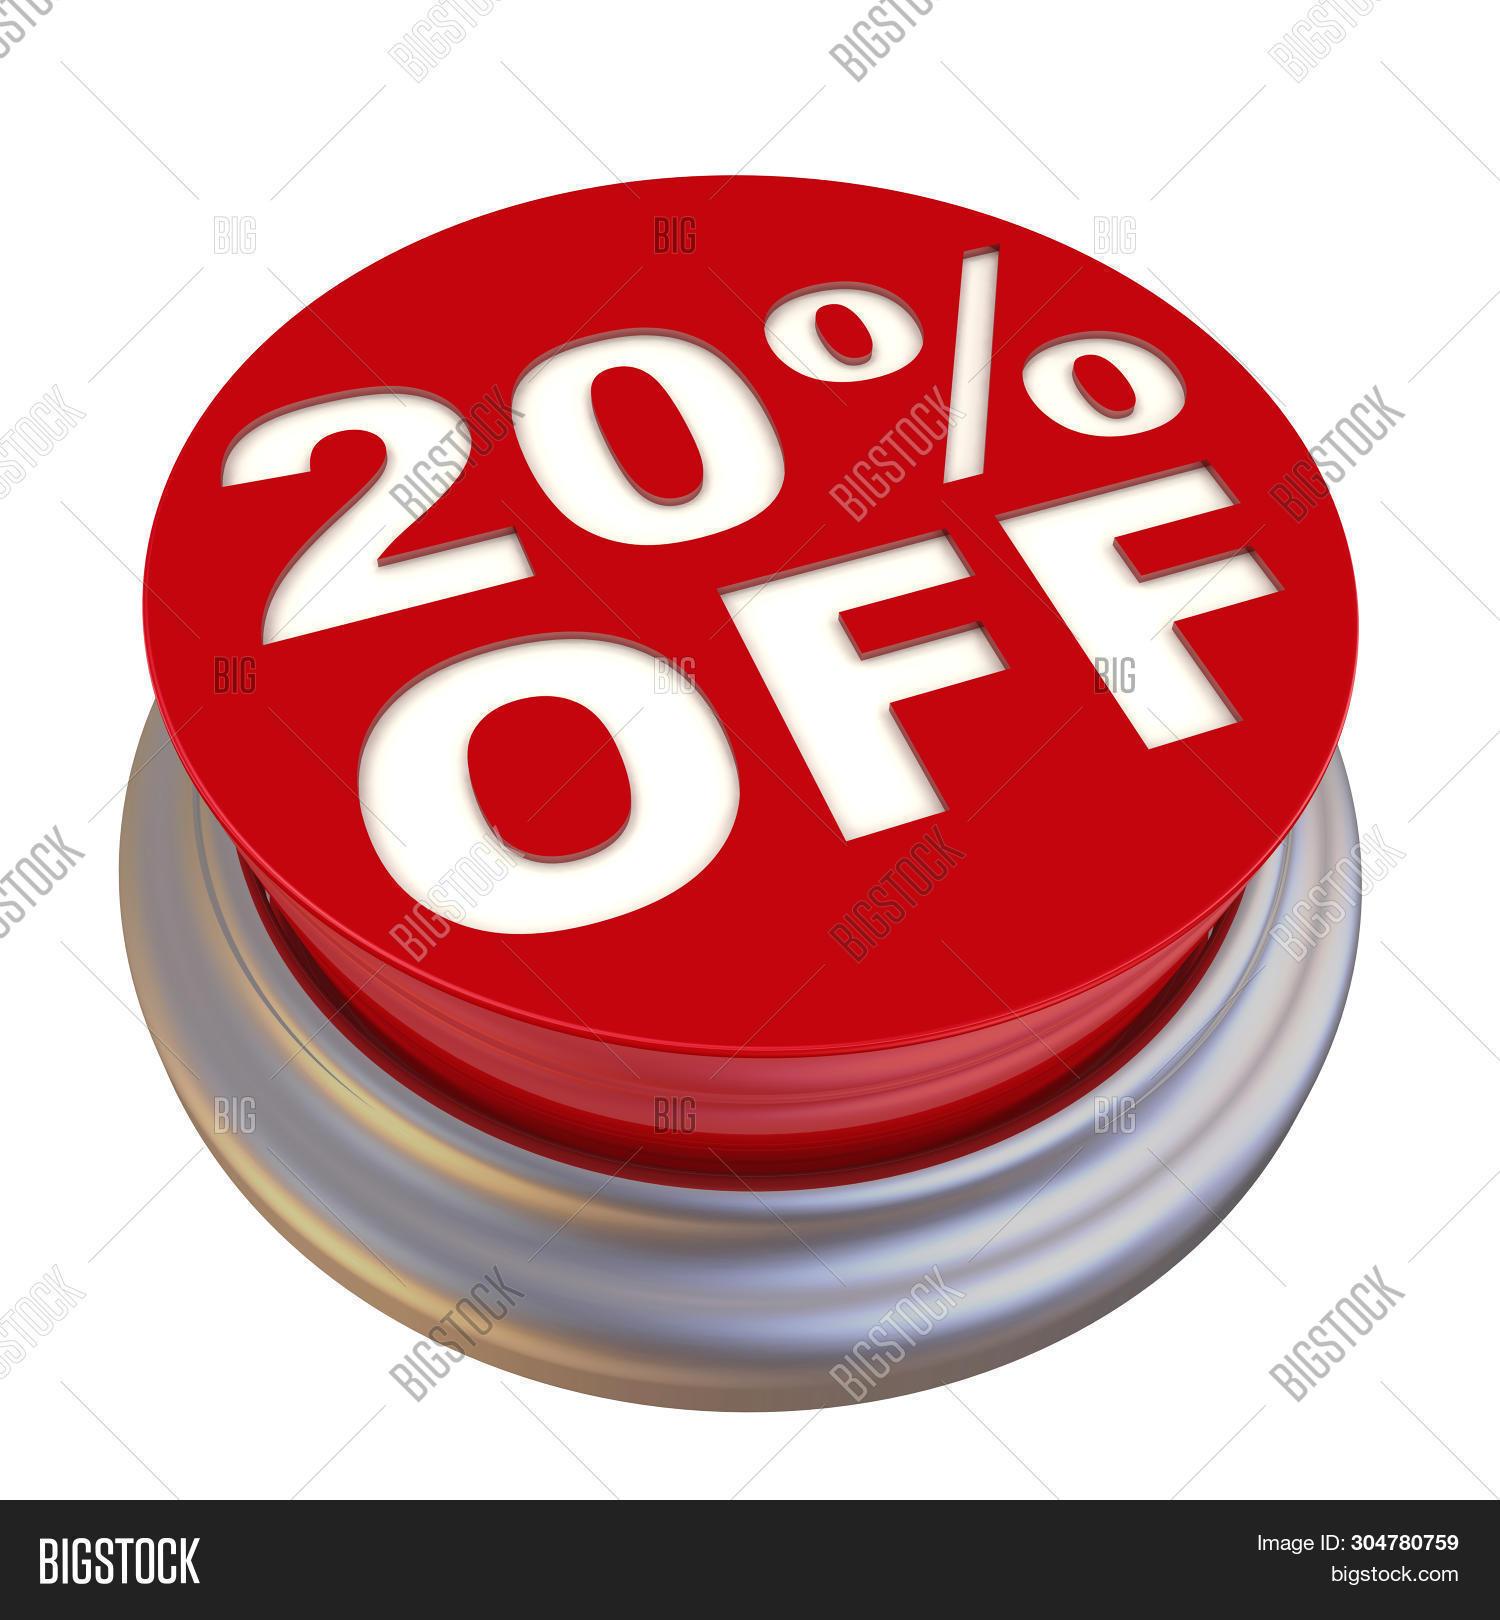 Discount Of Twenty Percentage. Red Circle Button Labeled 20% Off (twenty Percentage Discount) Isolat